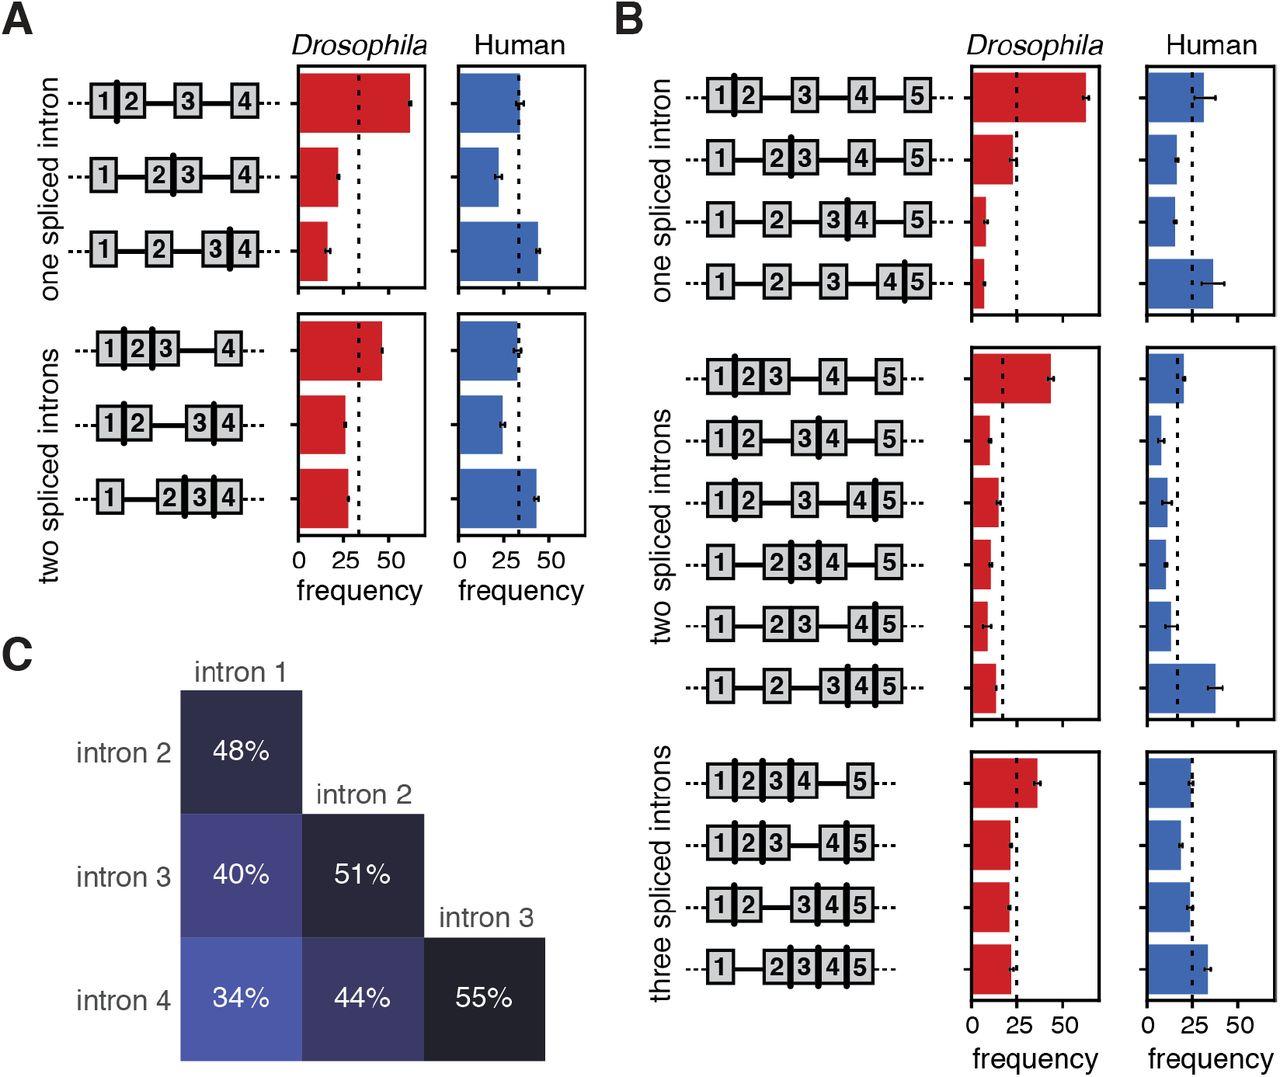 Human co-transcriptional splicing kinetics and coordination